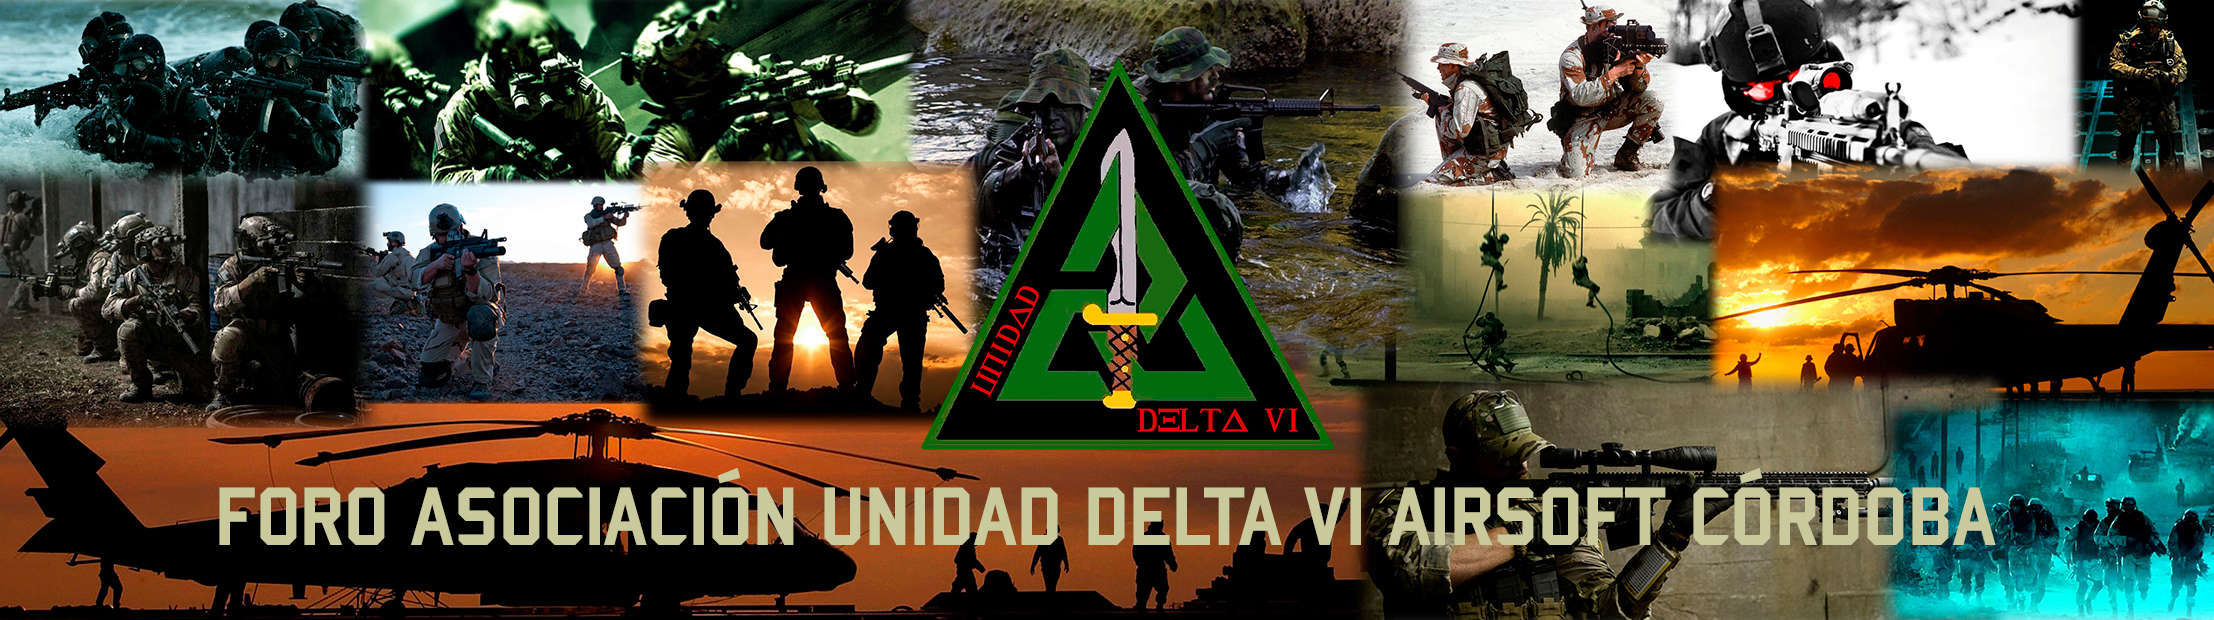 Unidad Delta VI Airsoft Córdoba